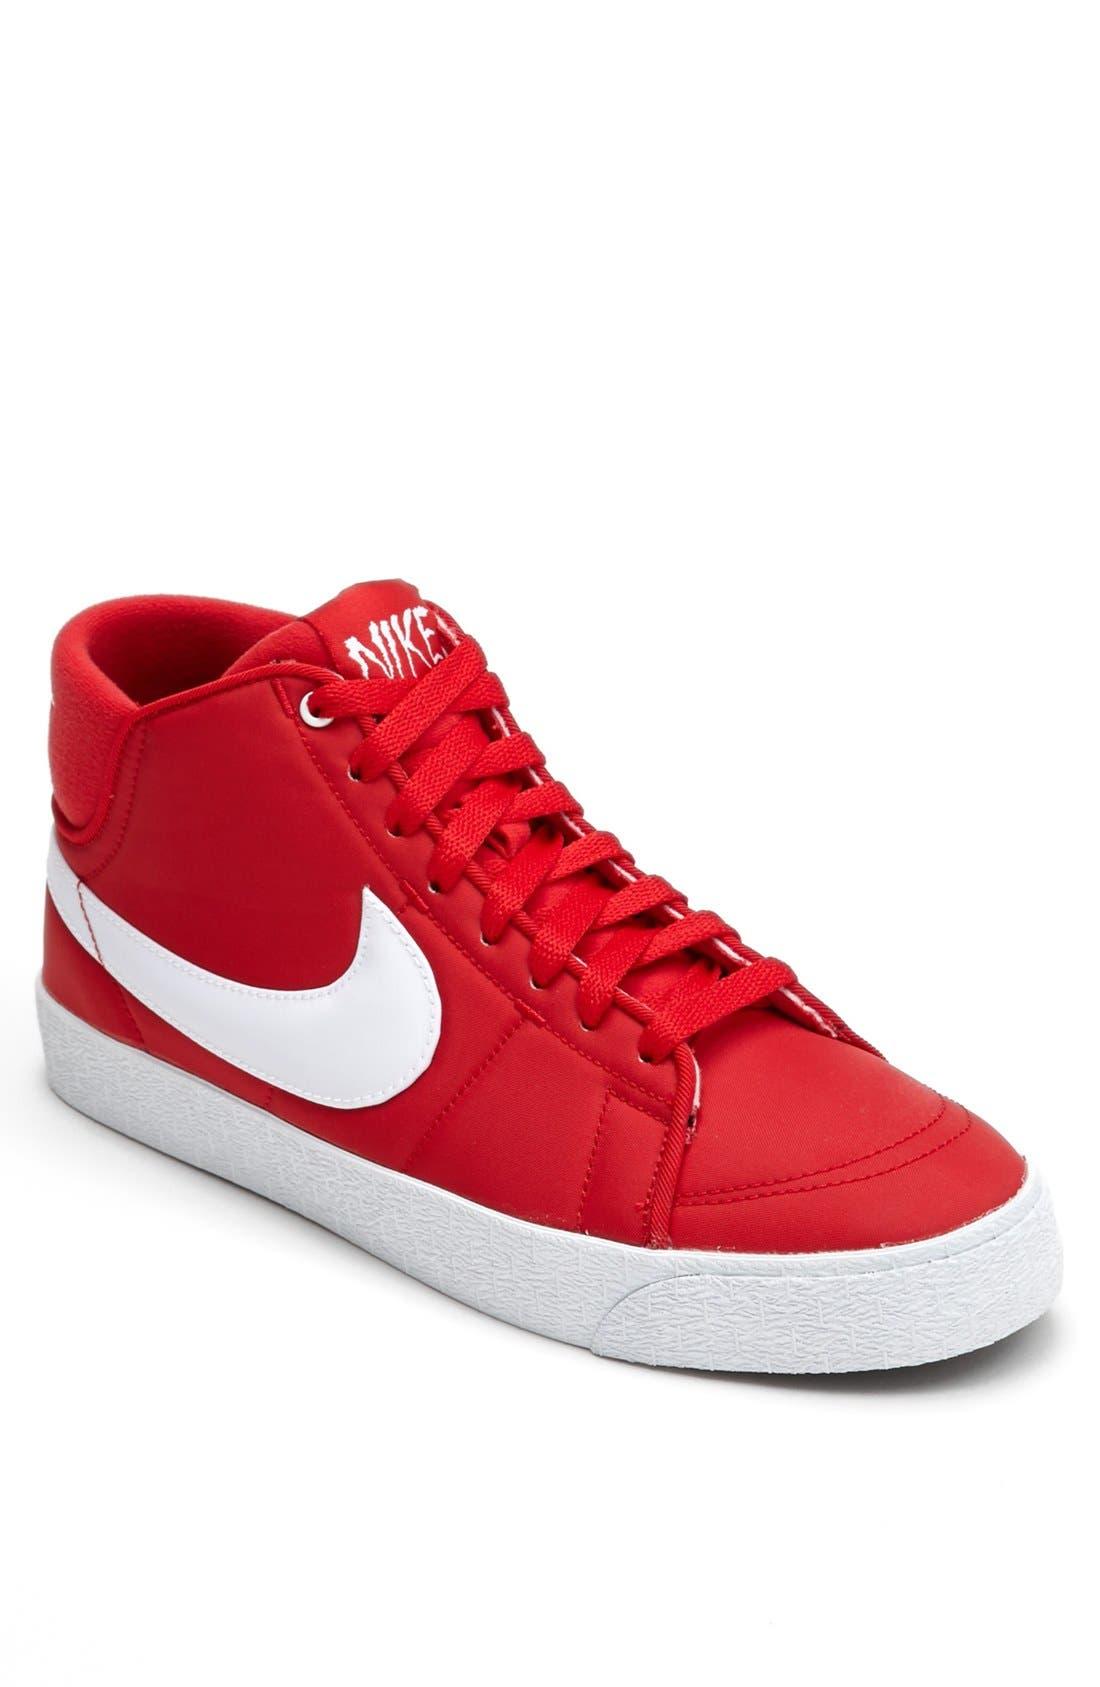 Main Image - Nike 'Blazer Mid LR NF' Skate Shoe (Men)